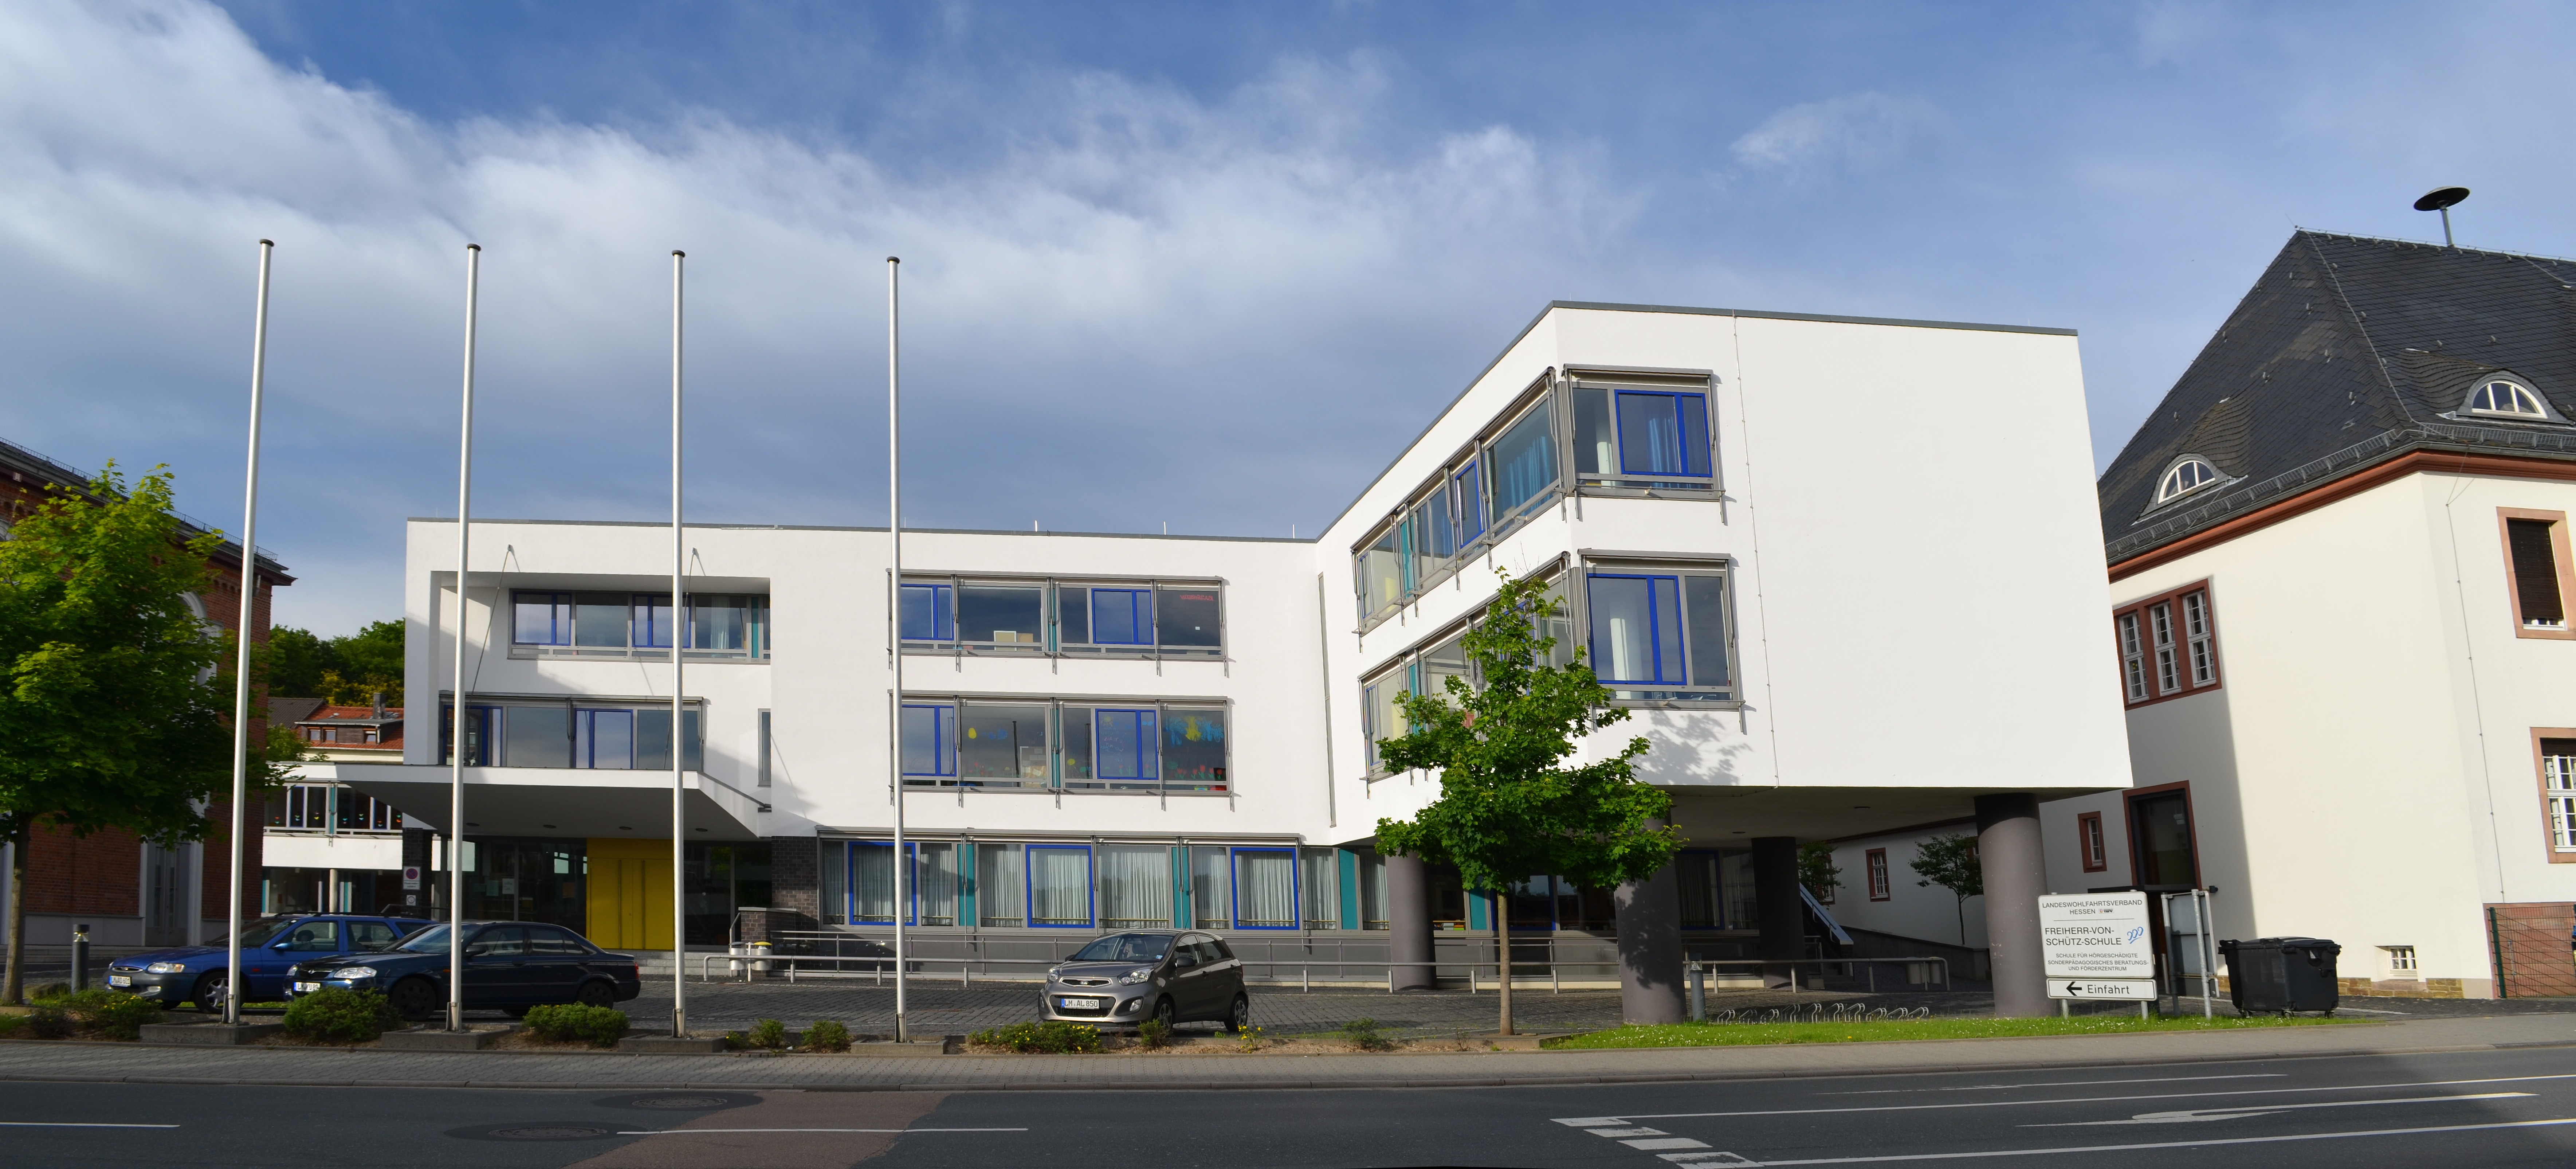 File:Bad Camberg, Freiherr von Schütz-Schule, Neubau.jpg - Wikimedia ...